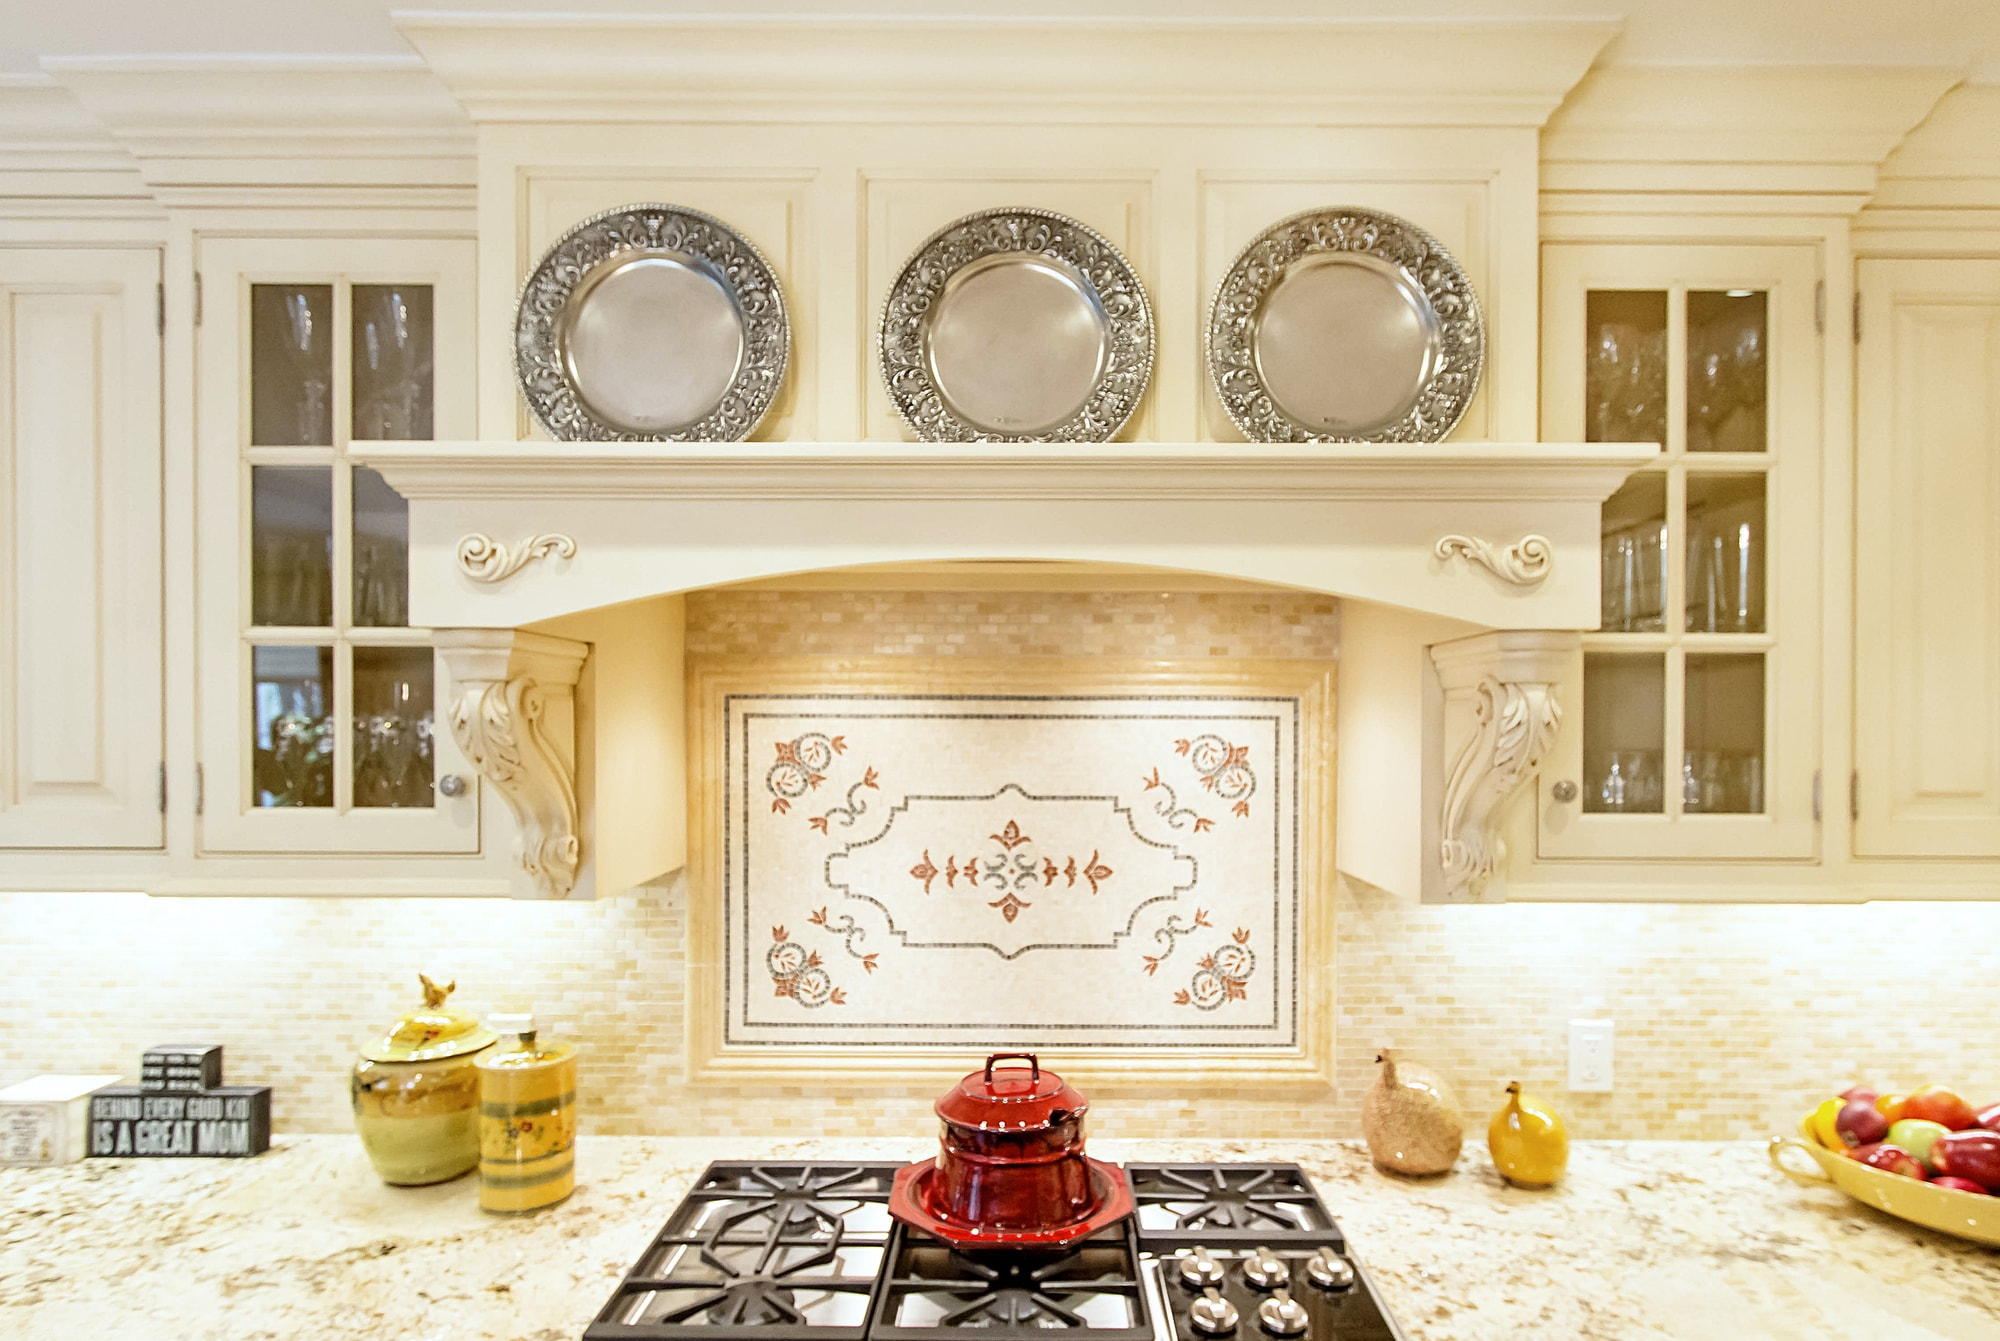 Traditional style kitchen gas range with custom tile backsplash